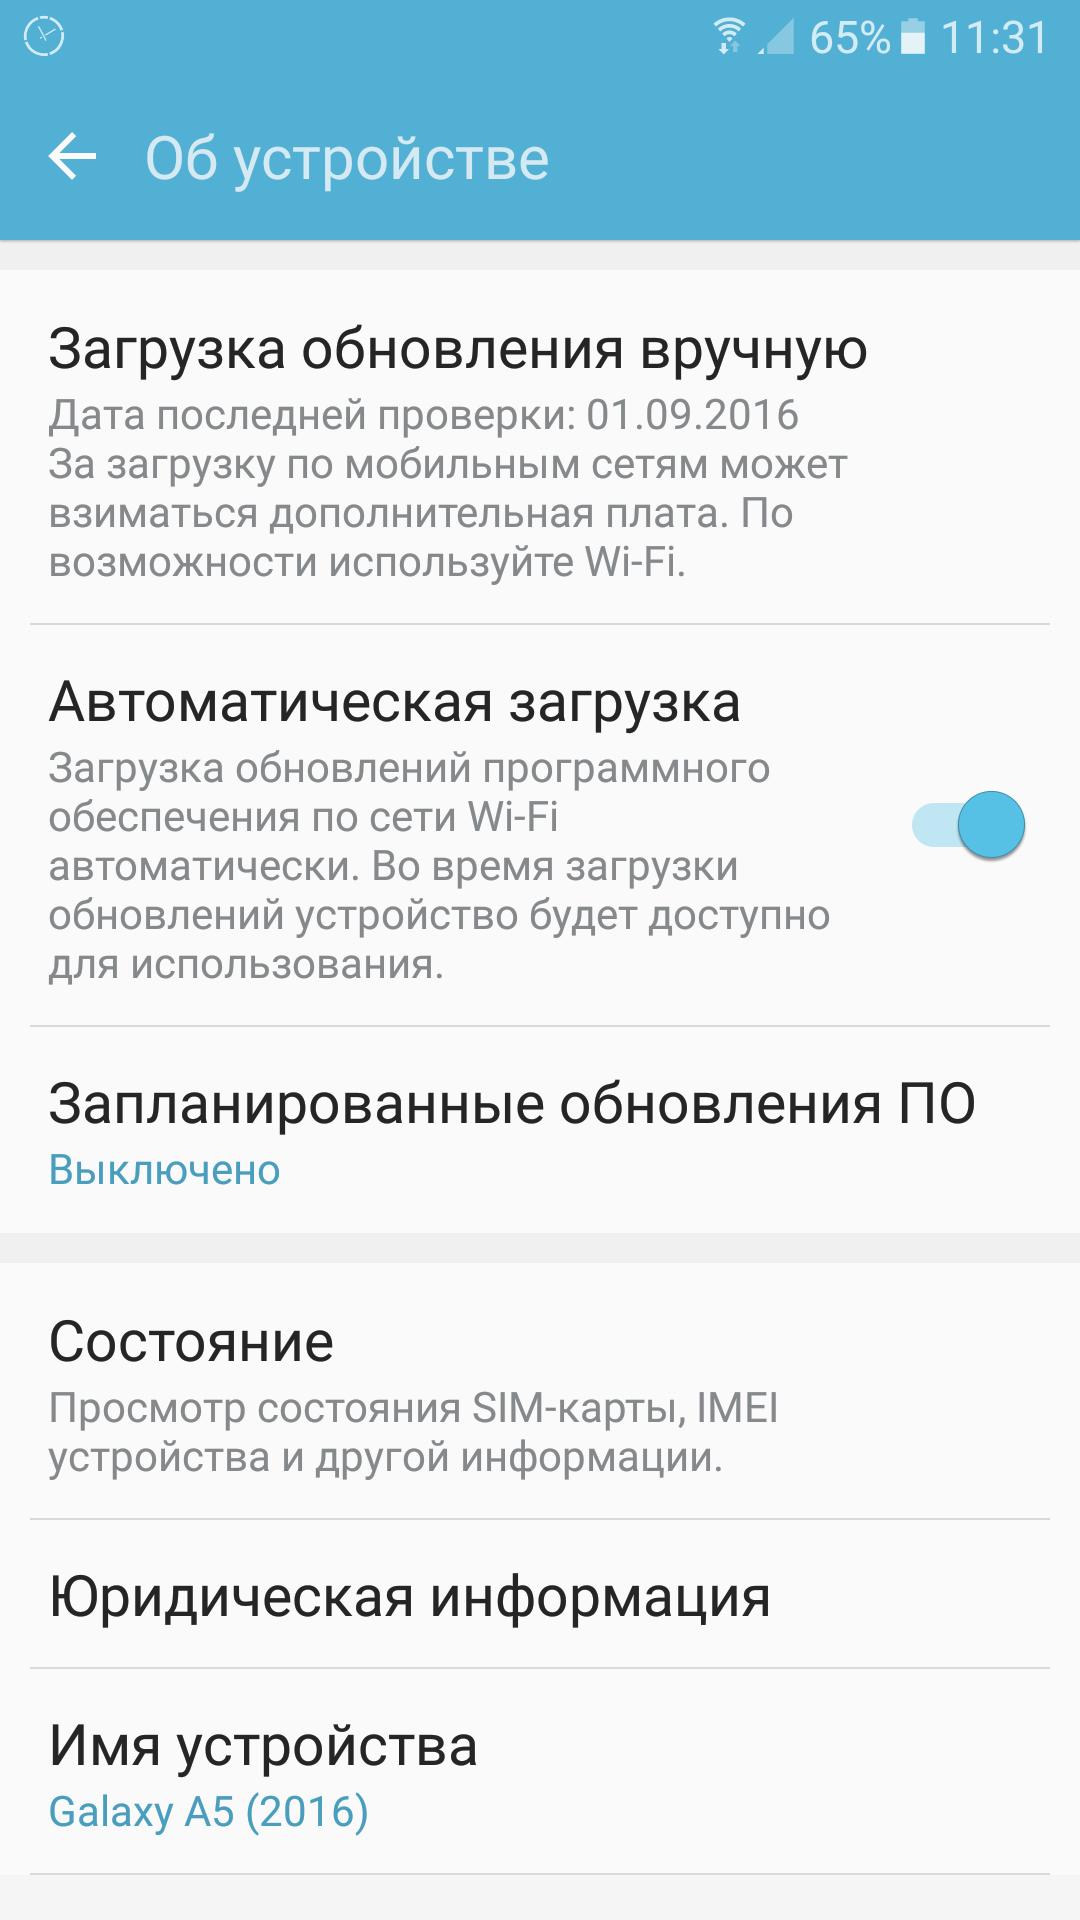 C:\Инструкции для Андроид\Kak_obnovit_Android_04.png